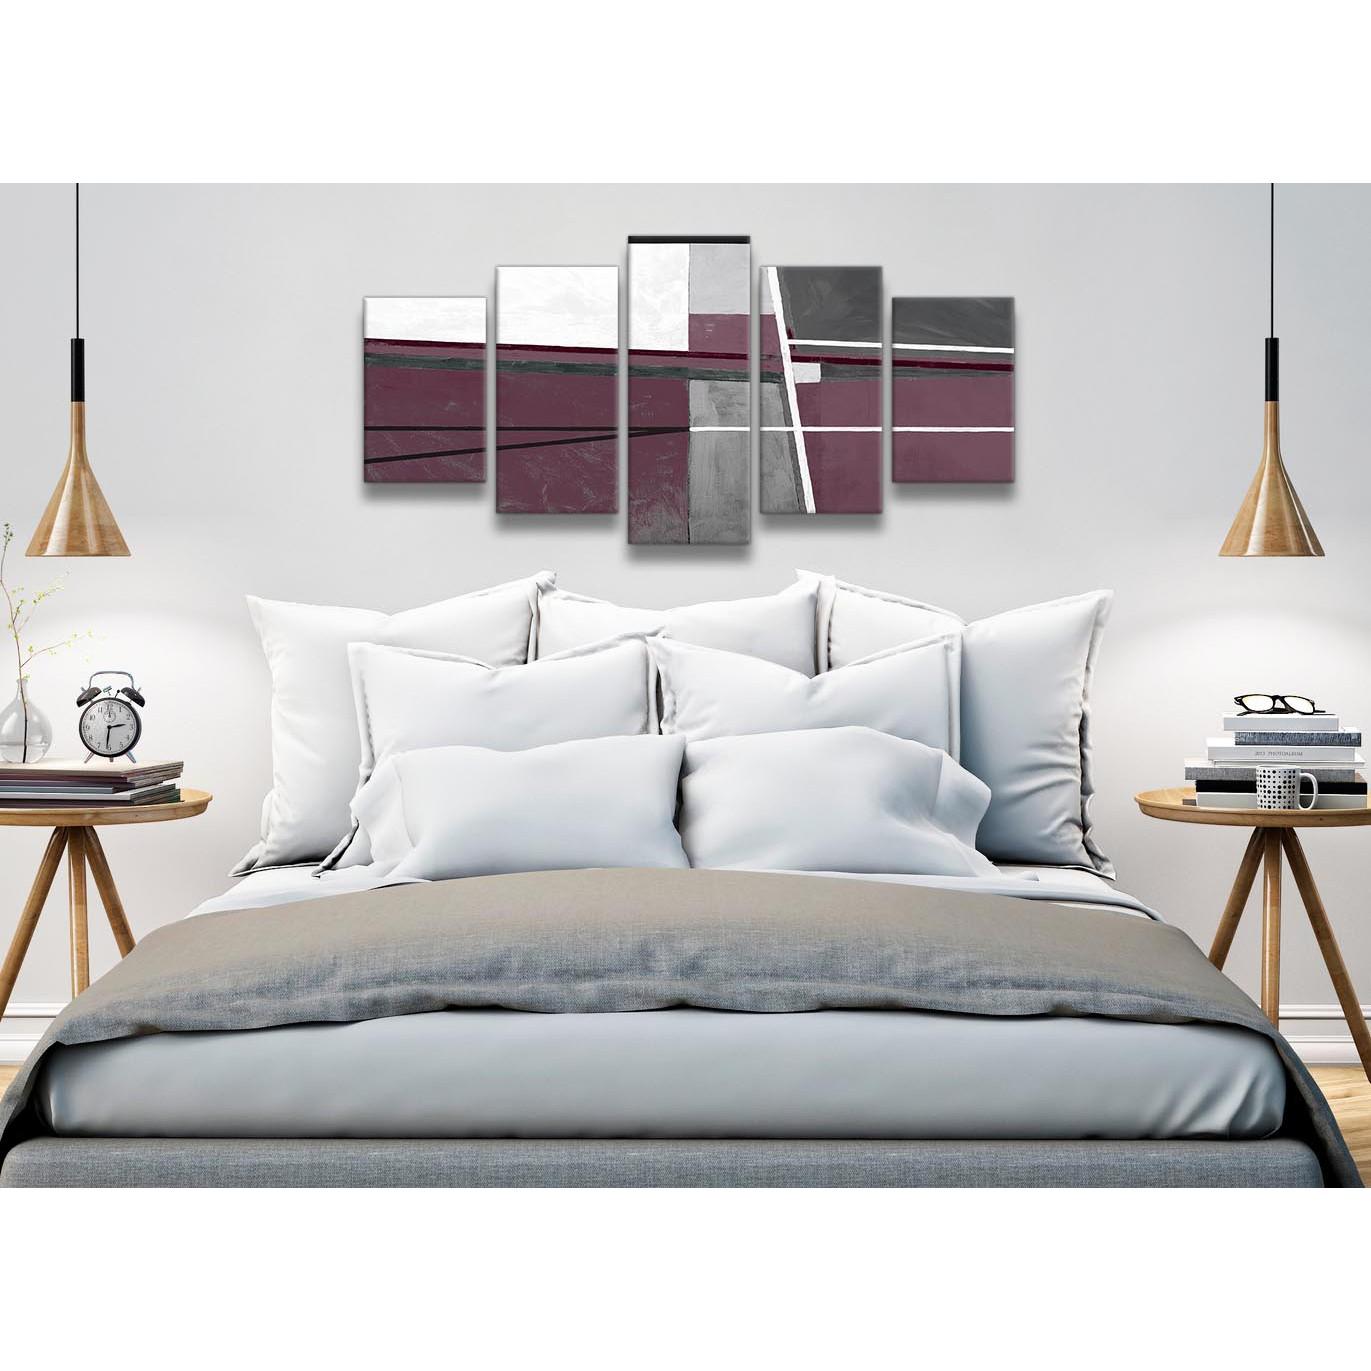 Plum Purple Grey Painting Kitchen Canvas Pictures: 5 Piece Plum Purple Grey Painting Abstract Dining Room